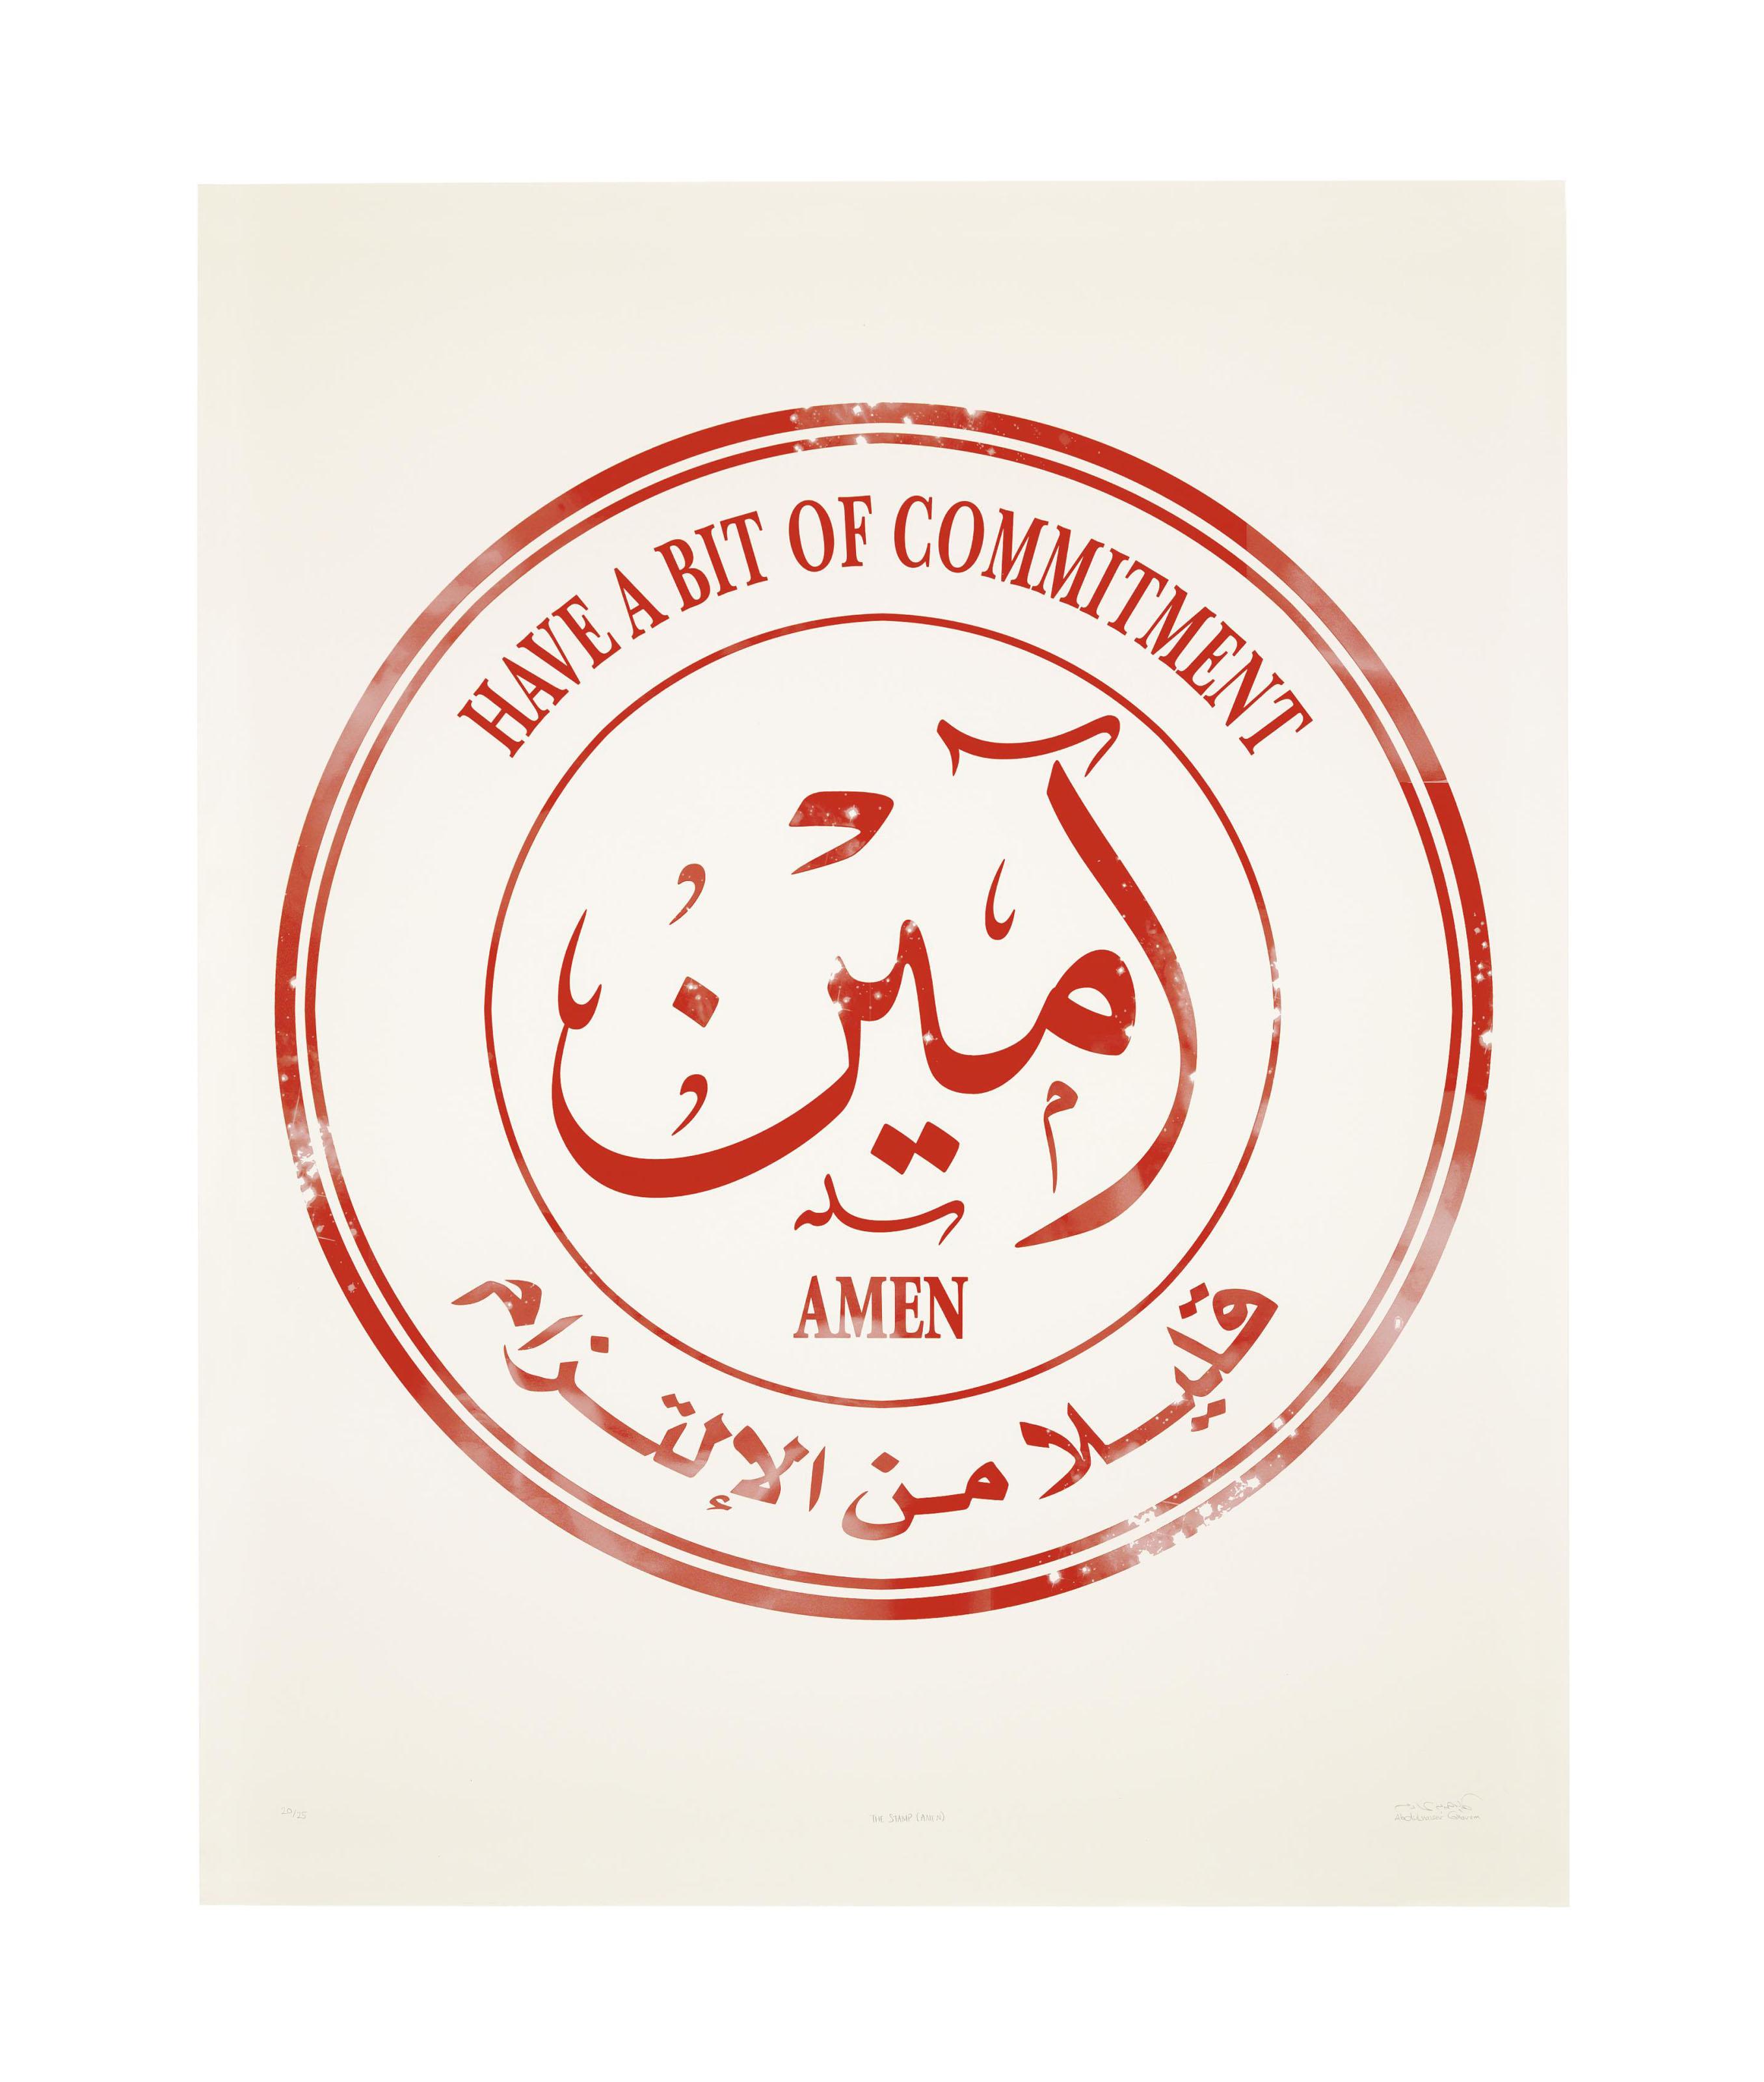 The Stamp (Amen)